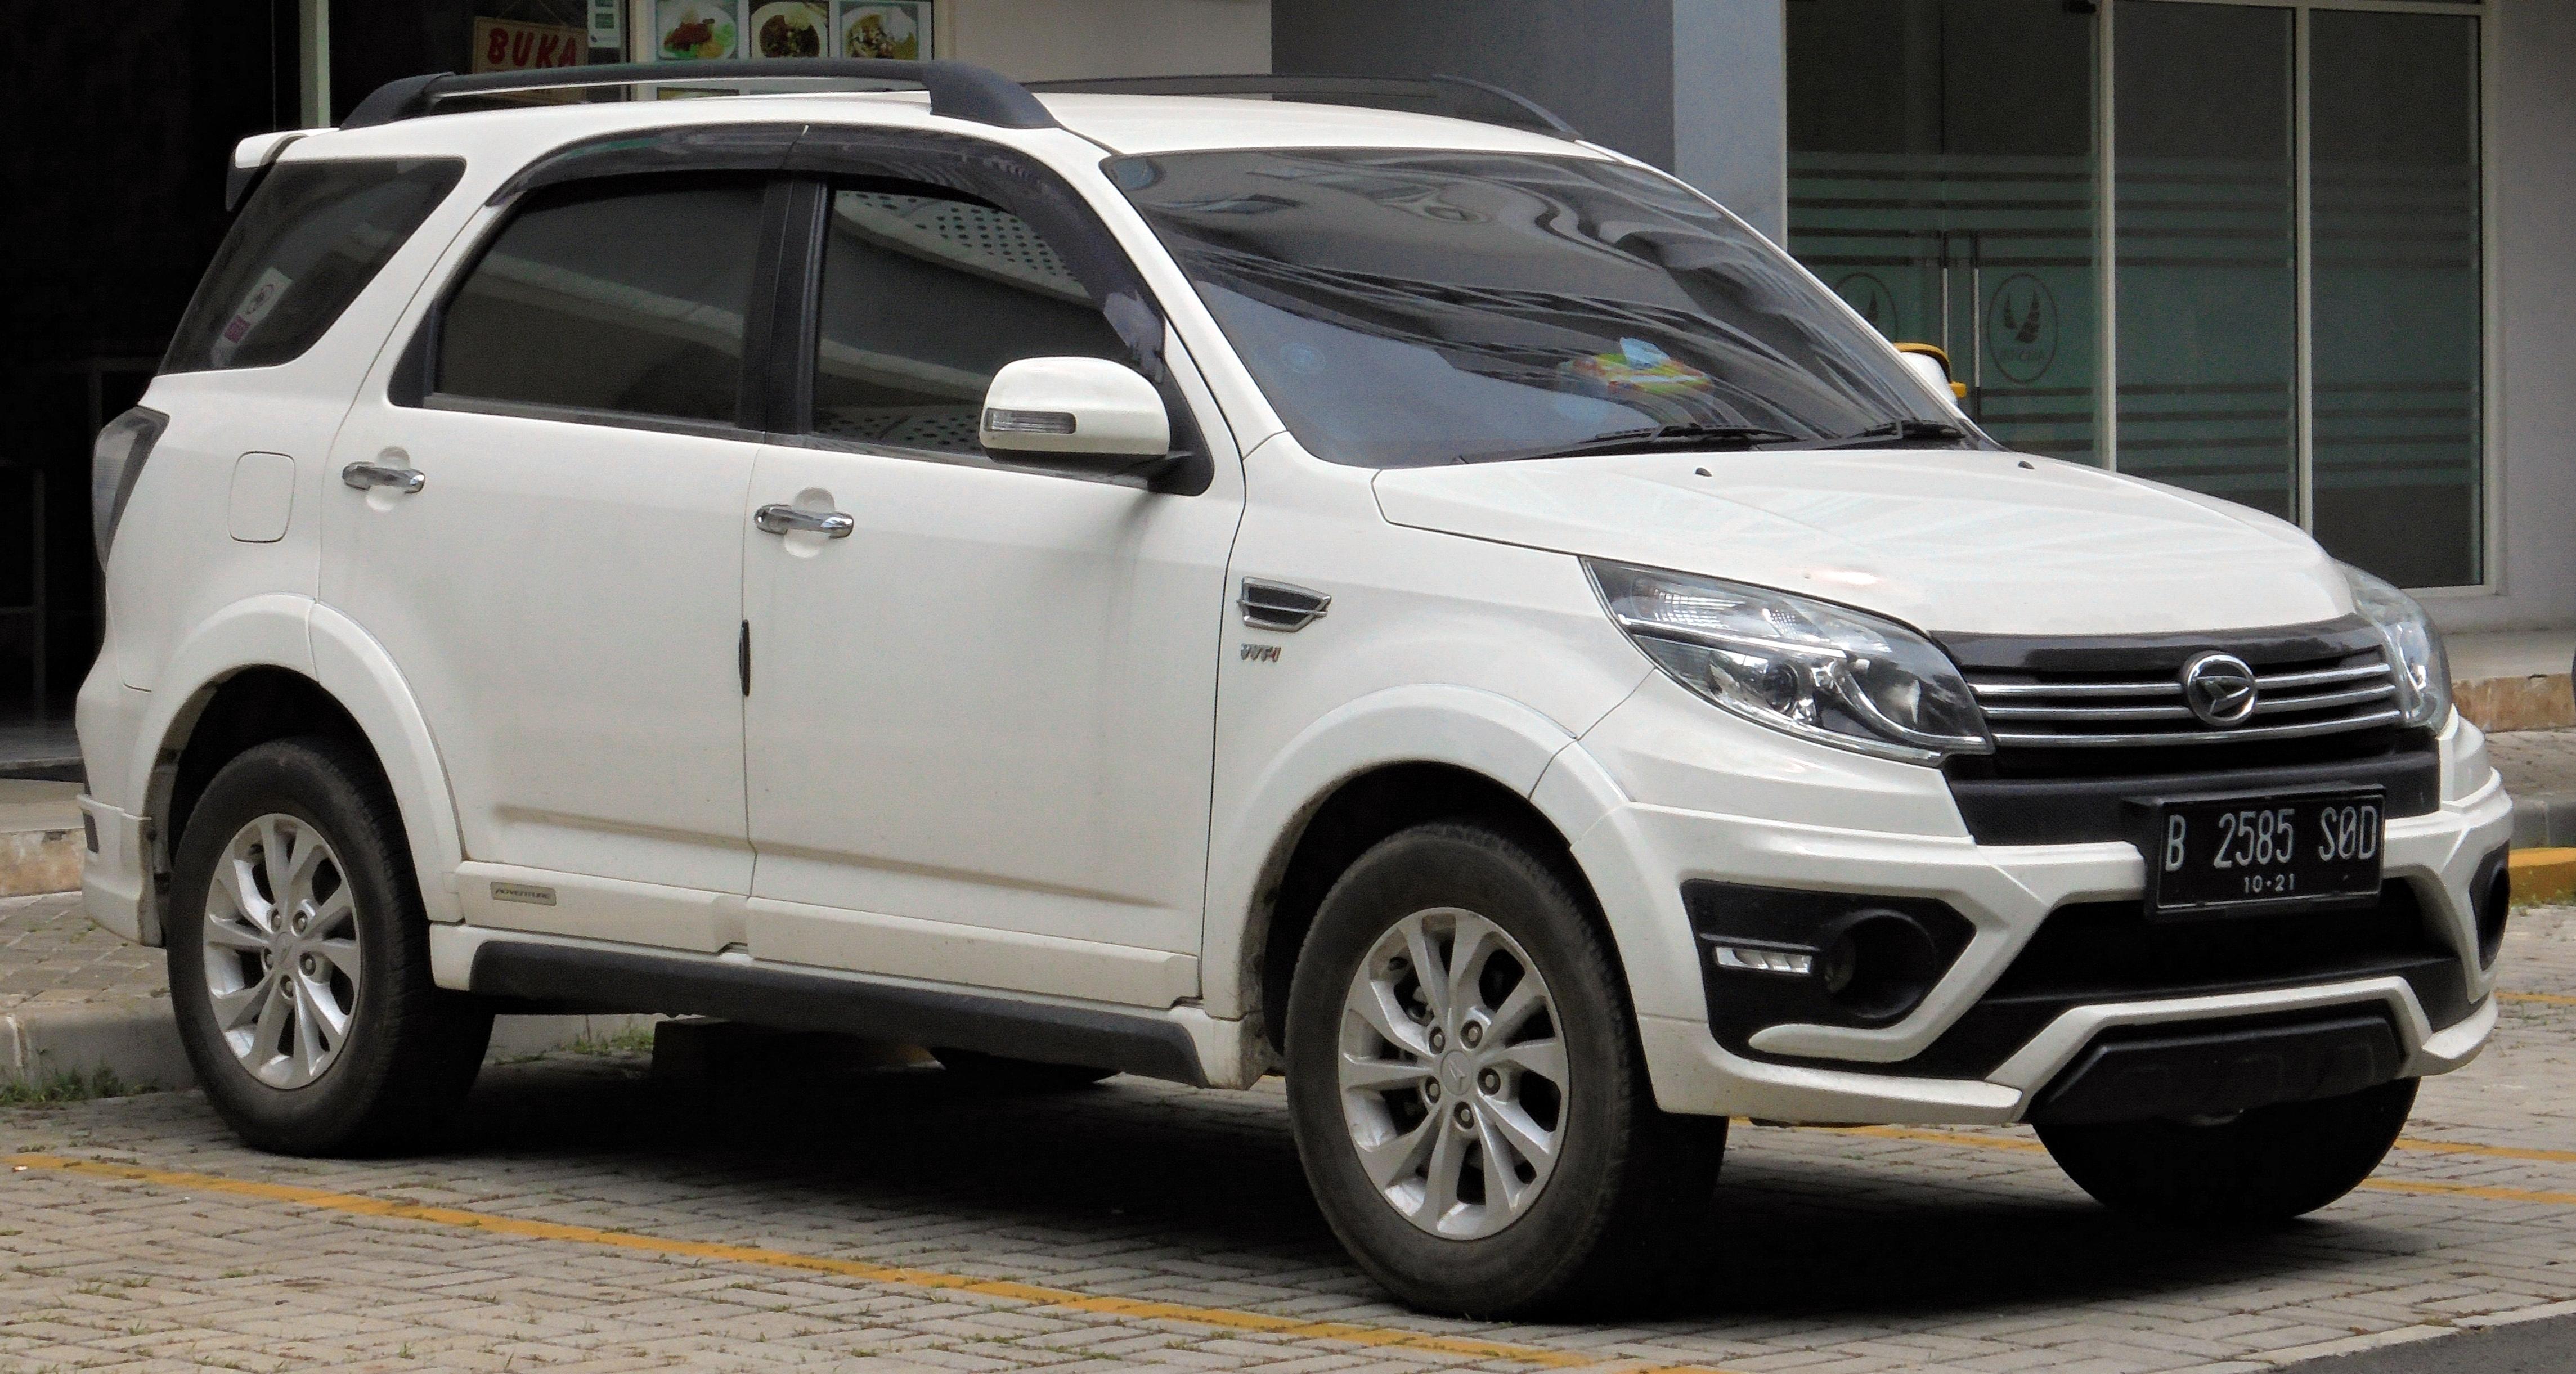 File:2016 Daihatsu Terios 1 5 R Adventure wagon (F700RG